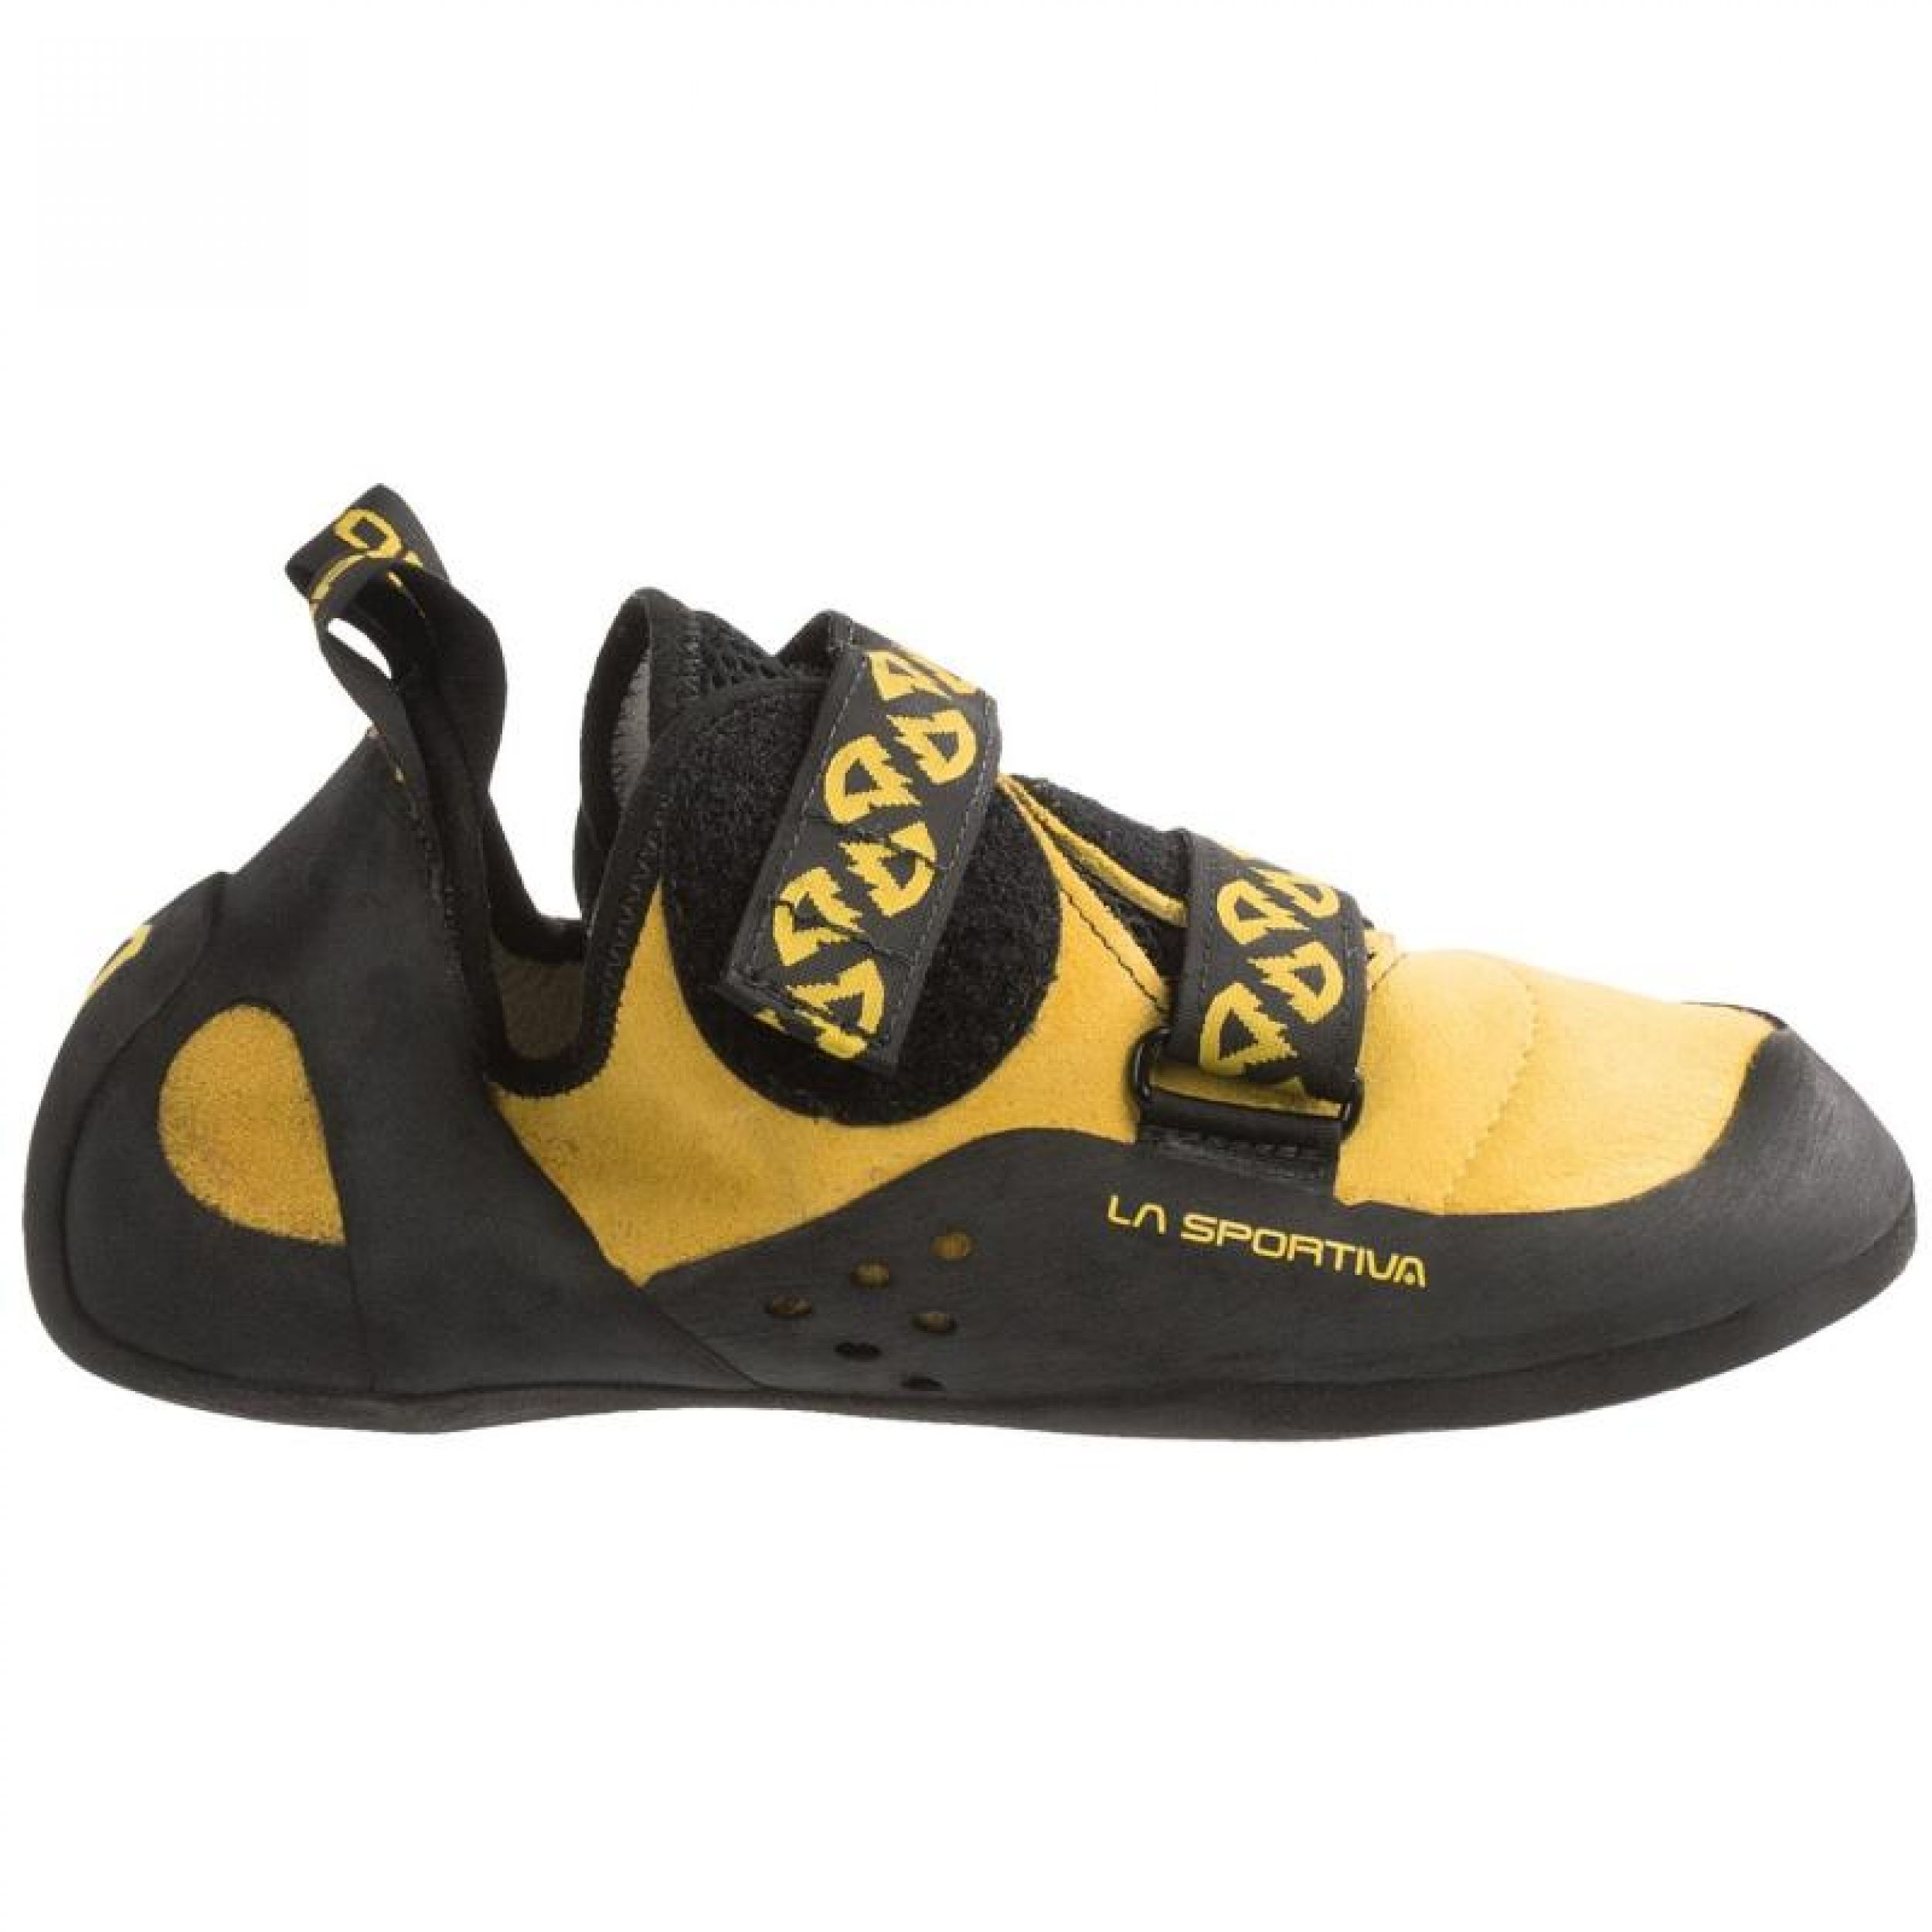 la-sportiva-katana-climbing-shoes-for-men-and-women-a-8411m_4-1500.1.jpg